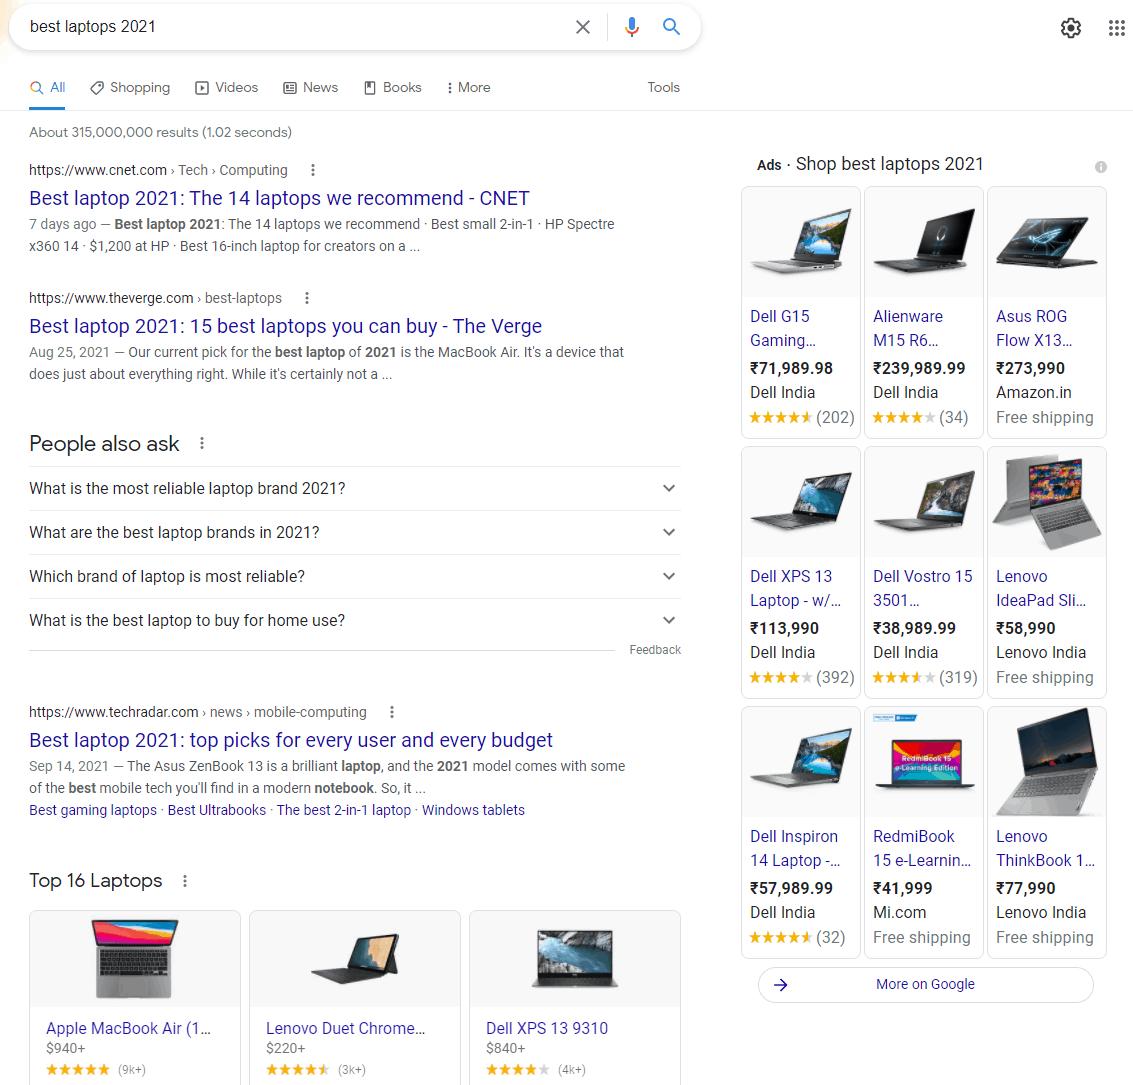 google search best laptops 2021